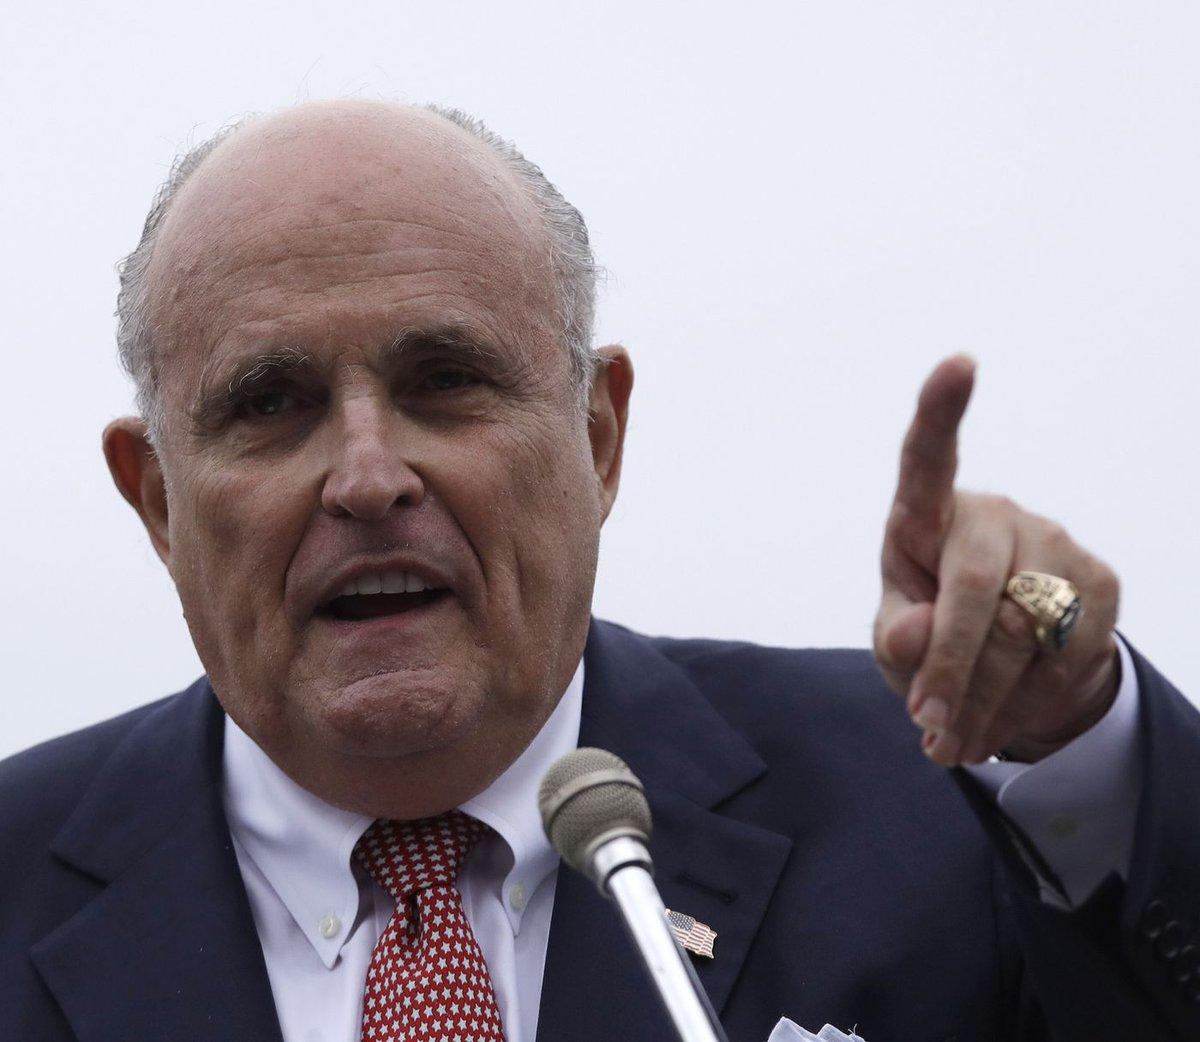 Rudy Giuliani blasts Omarosa, warns Robert Mueller against making Russia probe a 'bigger joke' by having her testify https://t.co/GaYJxf7KBX